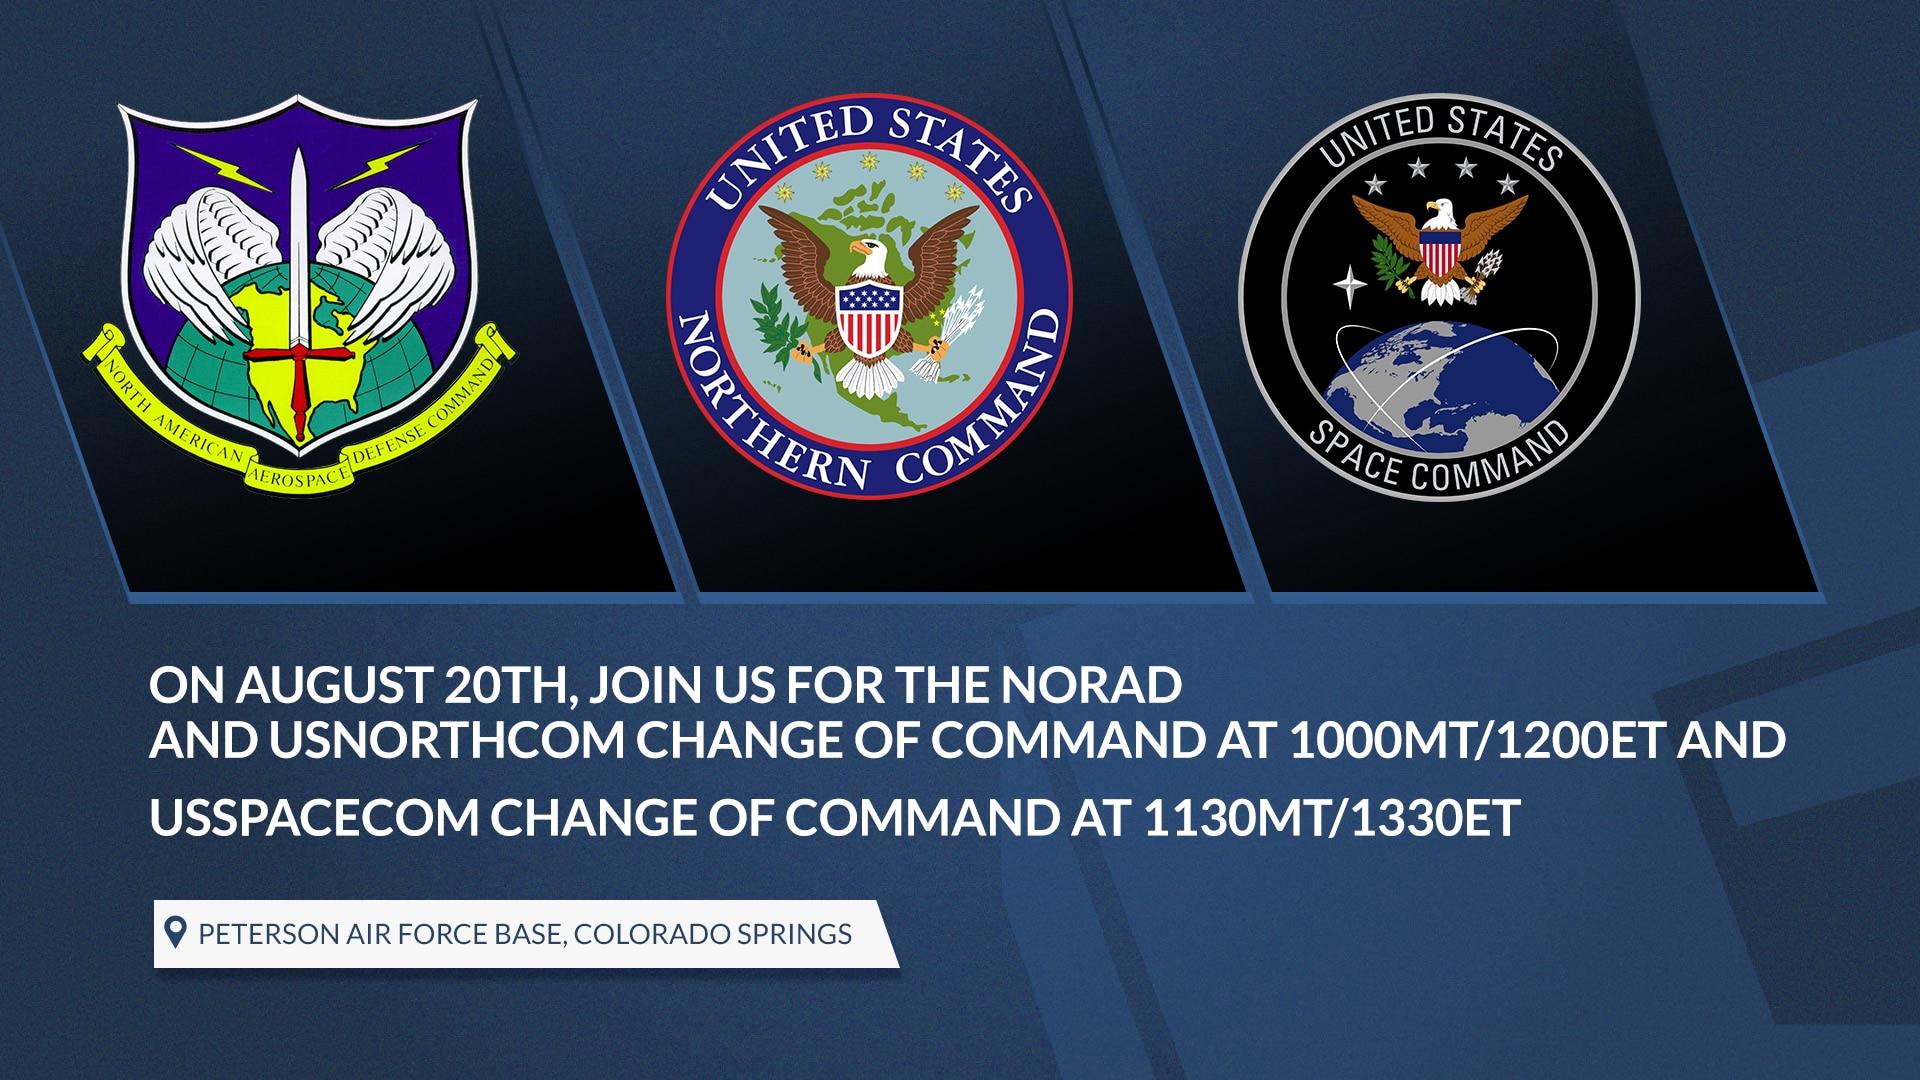 NORAD, USNORTHCOM, USSPACECOM to host change of command ceremonies Aug. 20